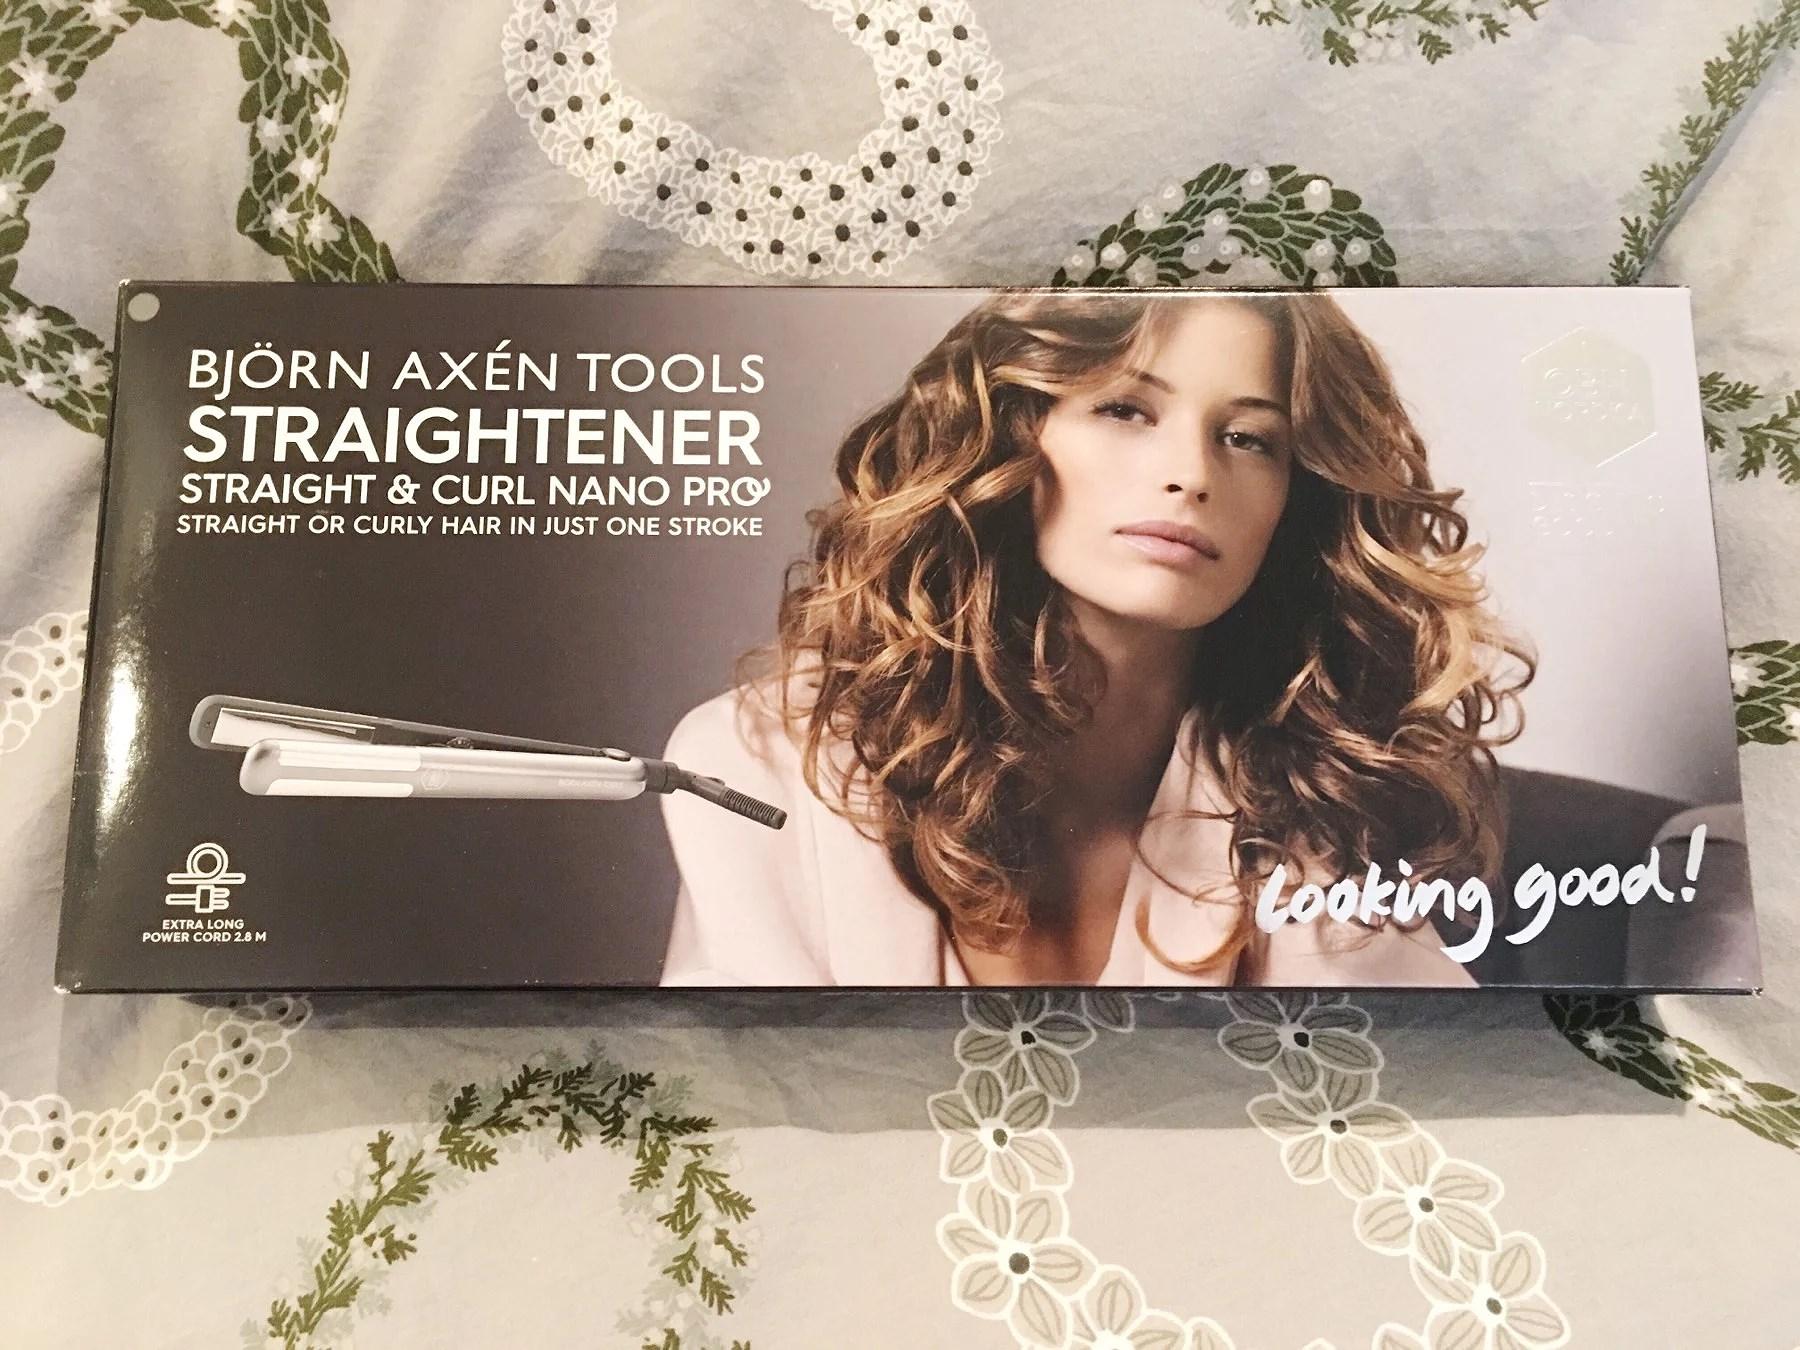 Björn Axén Straight & Curl